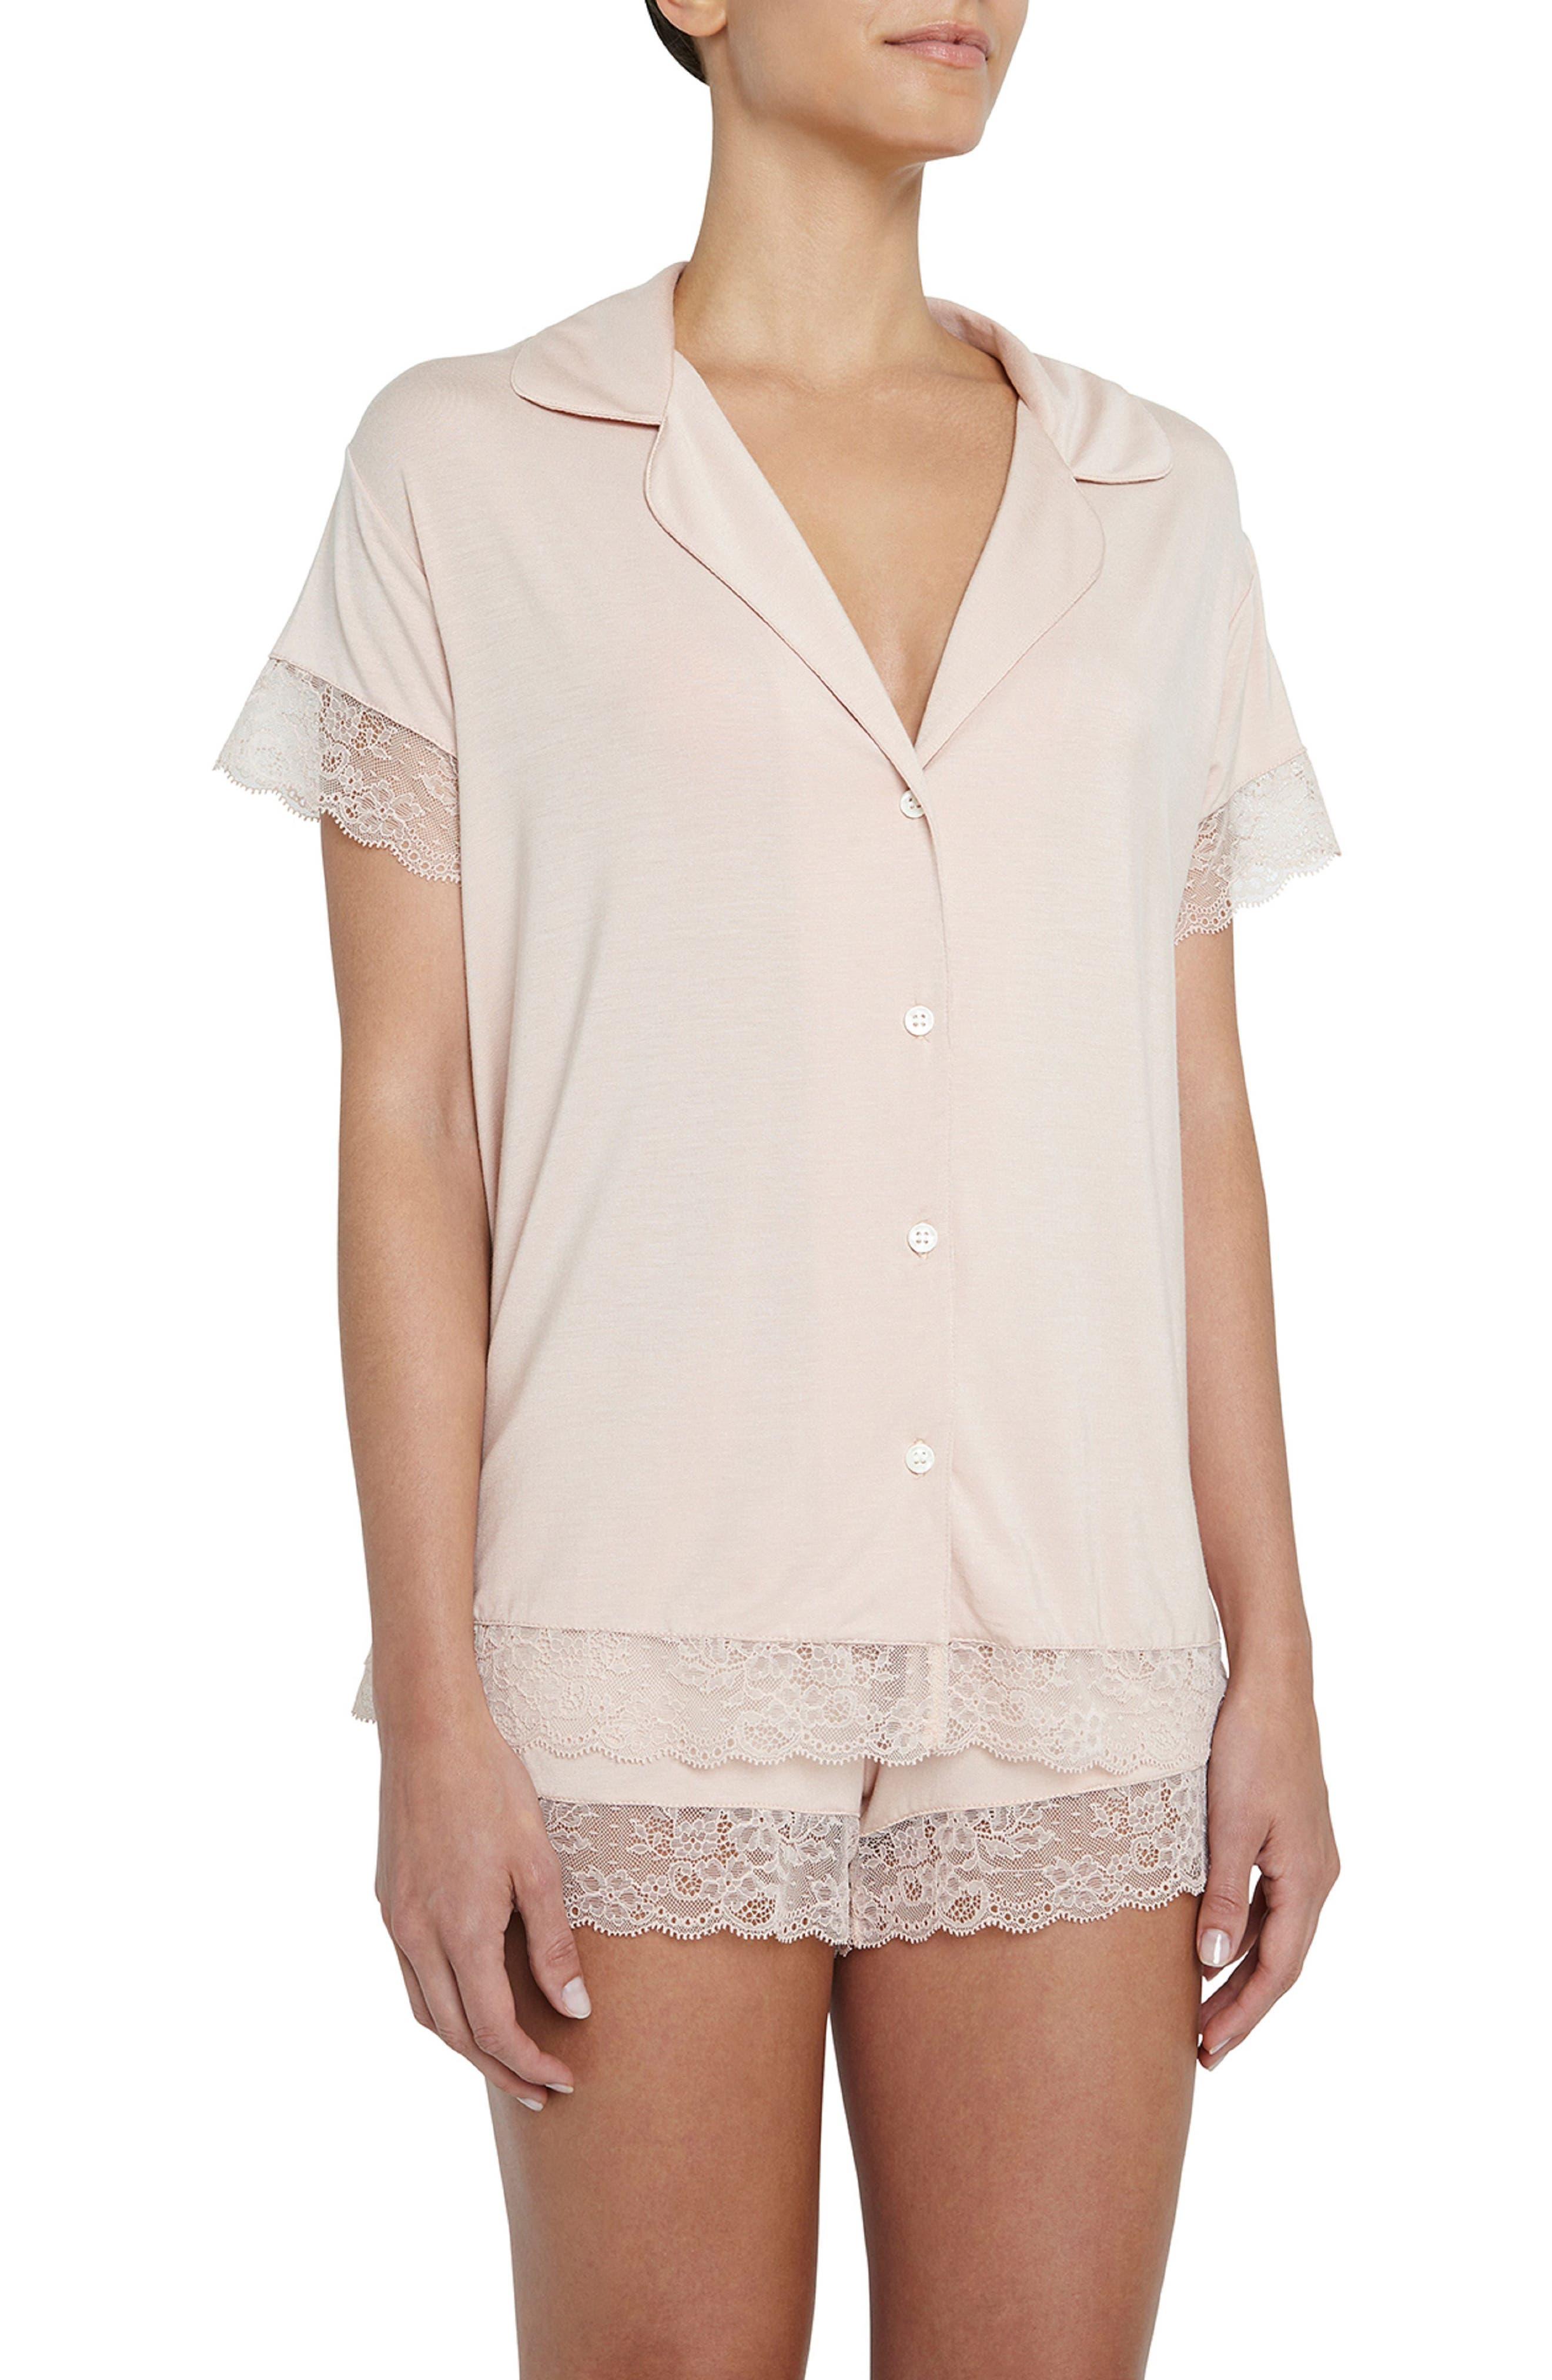 Eberjey Malou the Lace Short Pajamas